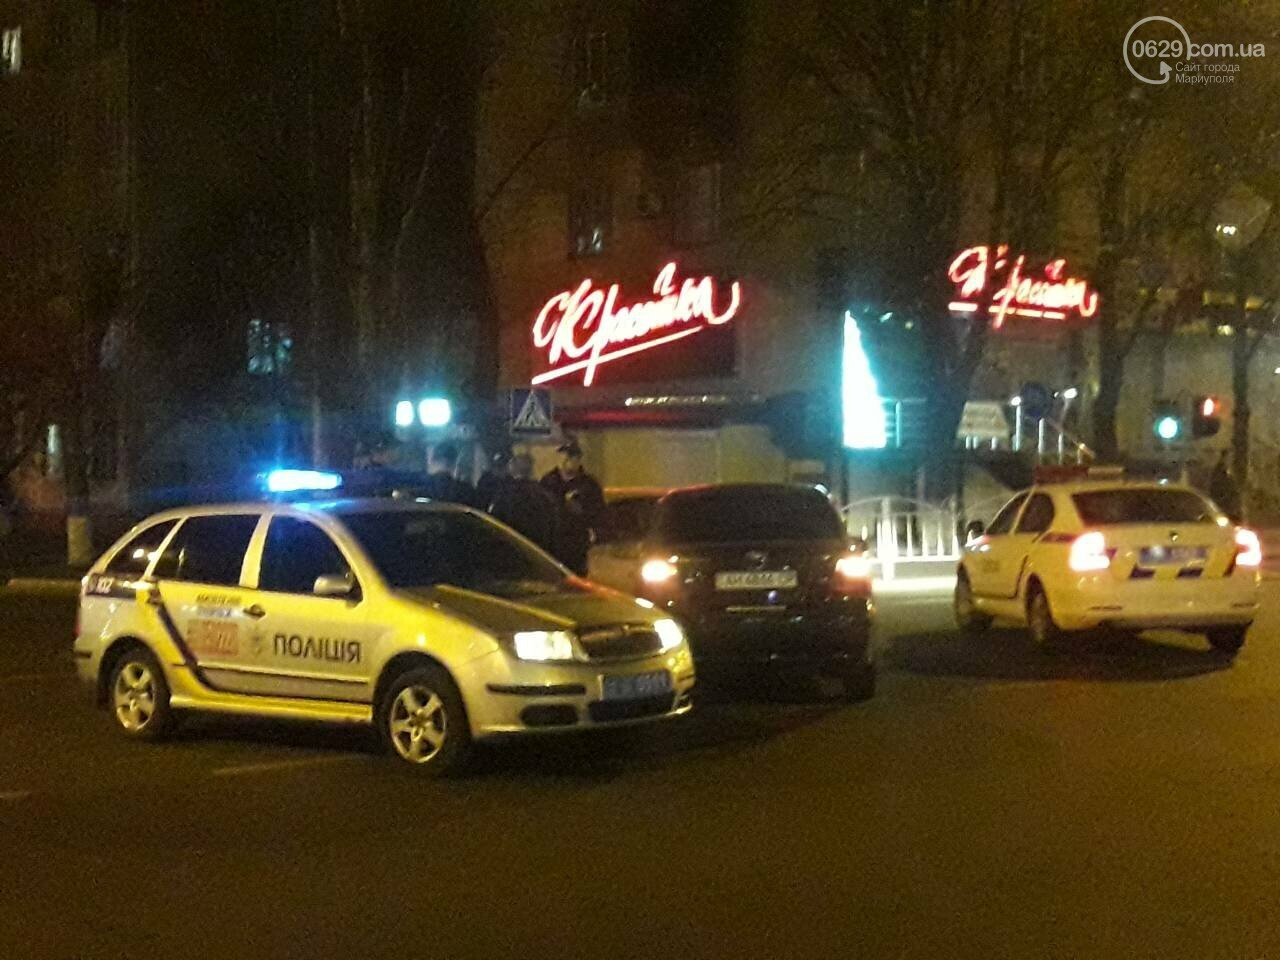 В центре Мариуполя столкнулись два автомобиля, — ФОТО, фото-4